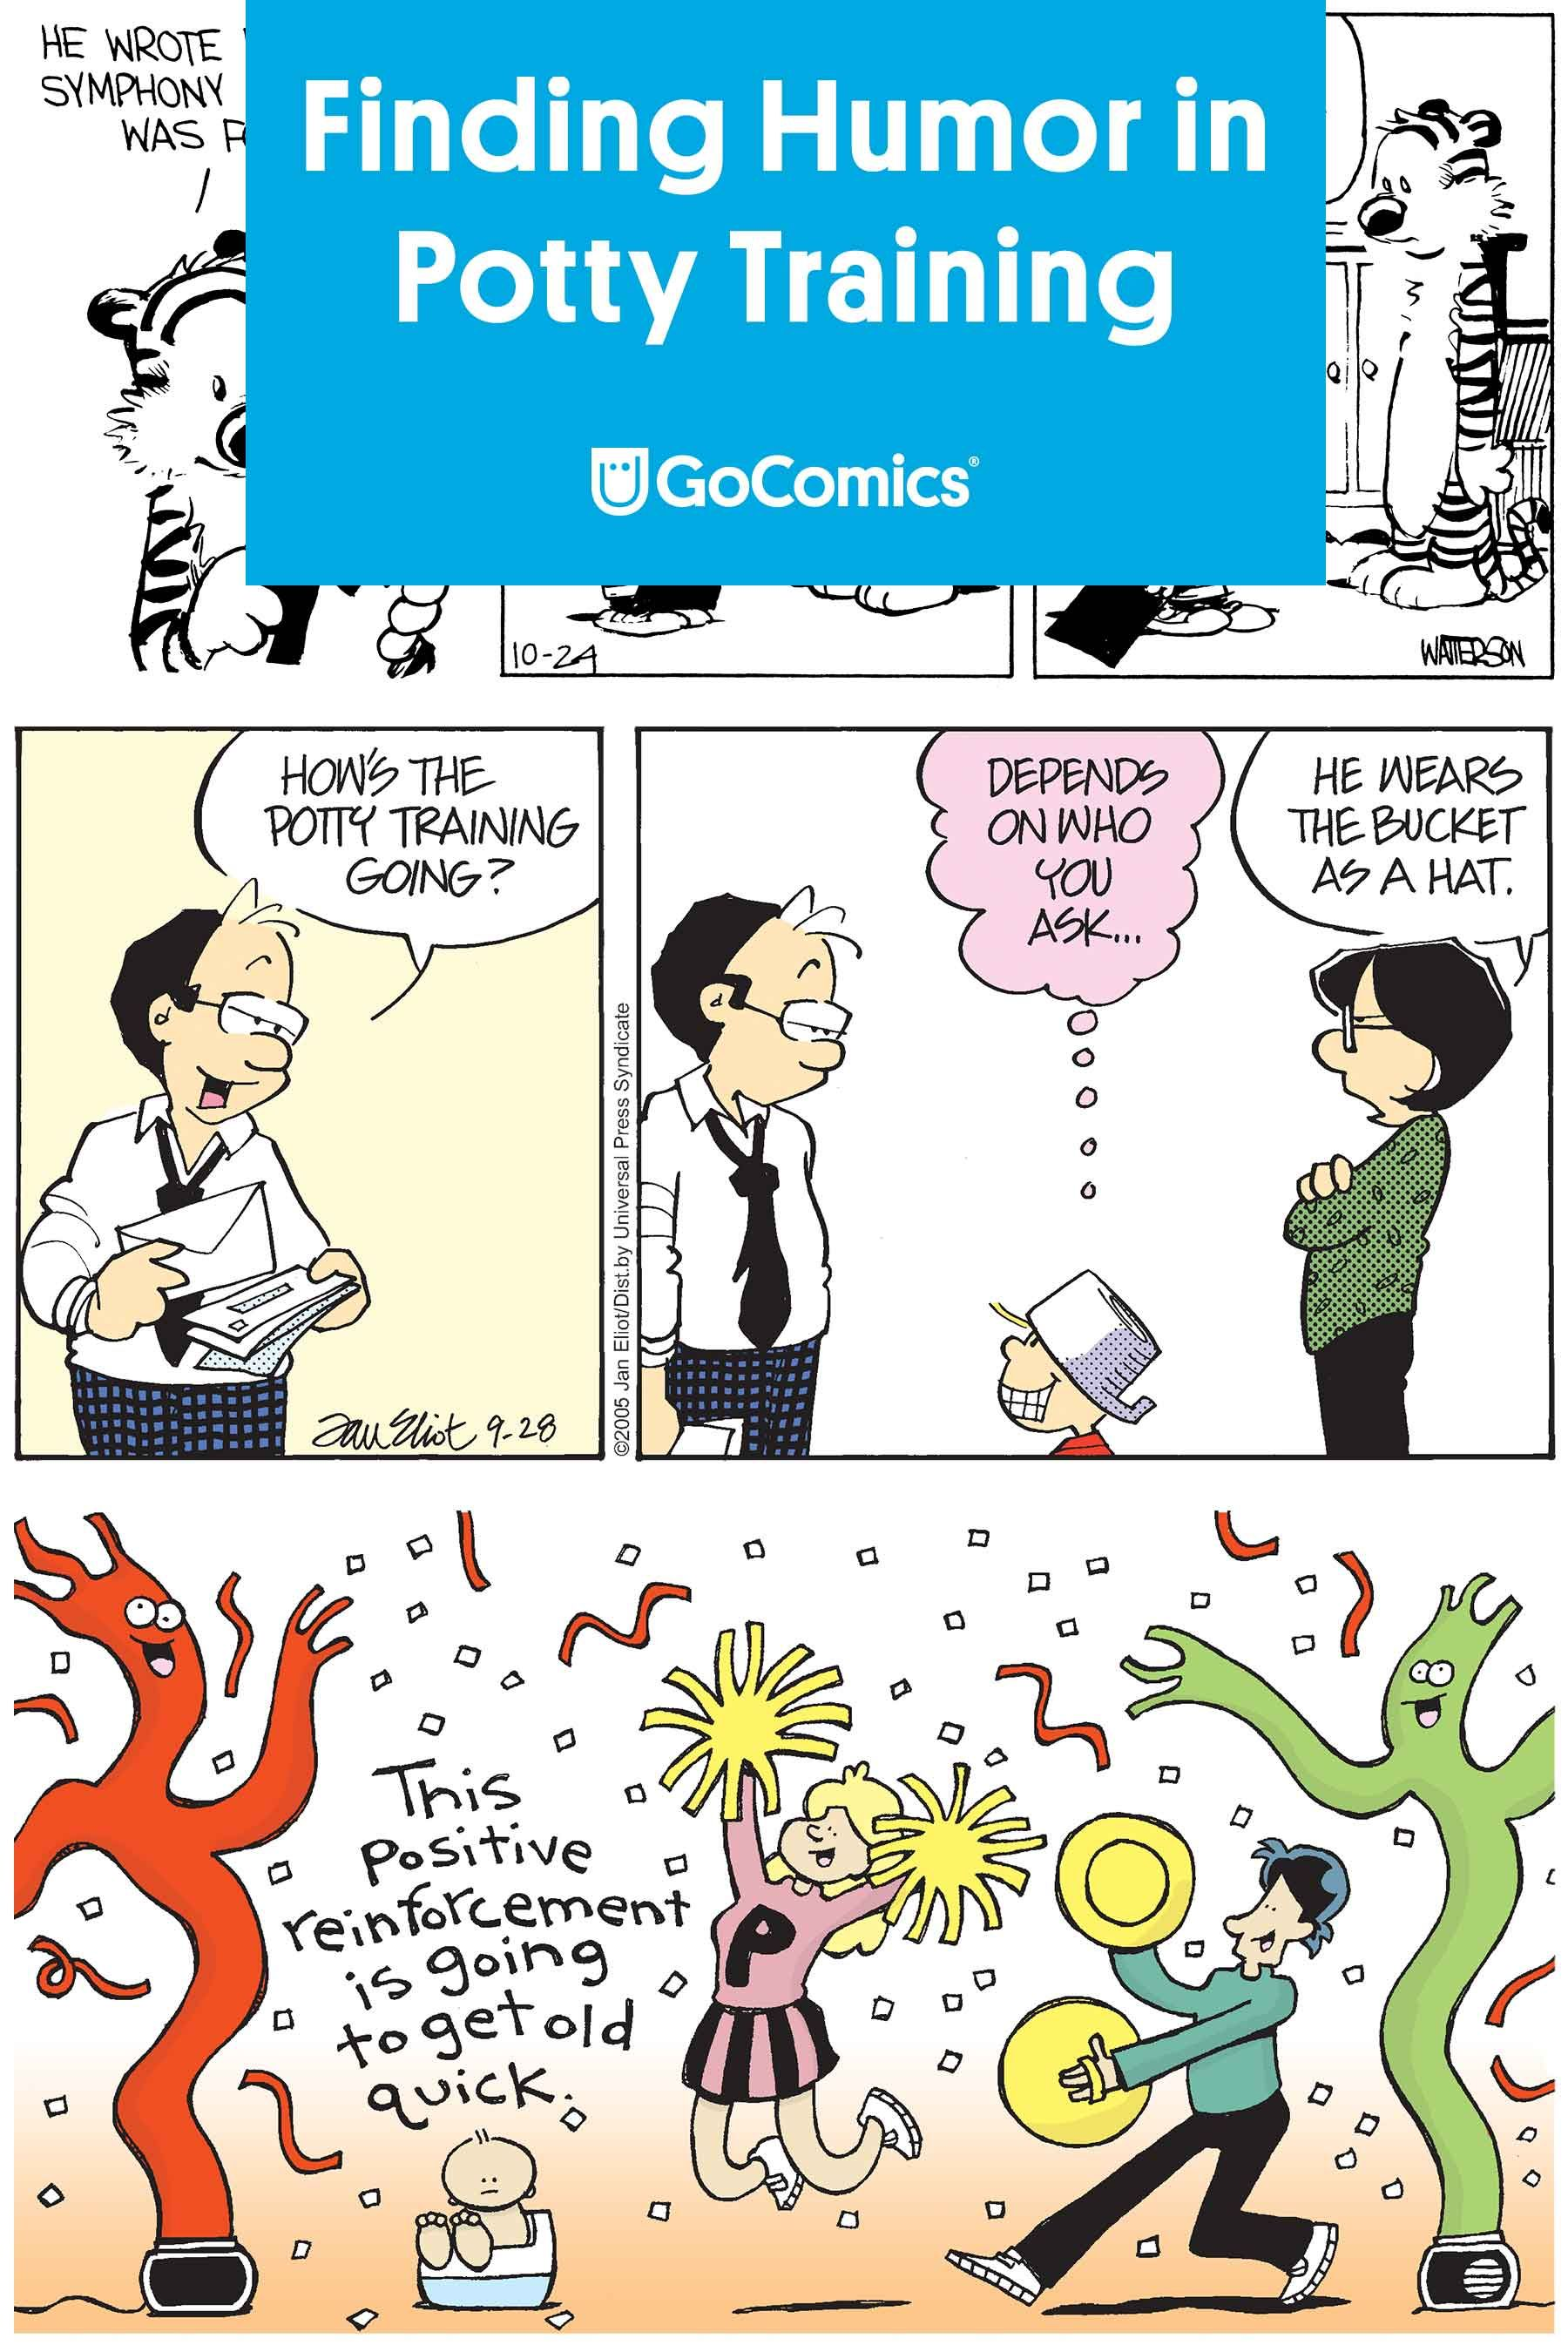 Finding Humor in Potty Training | Potty training humor ...